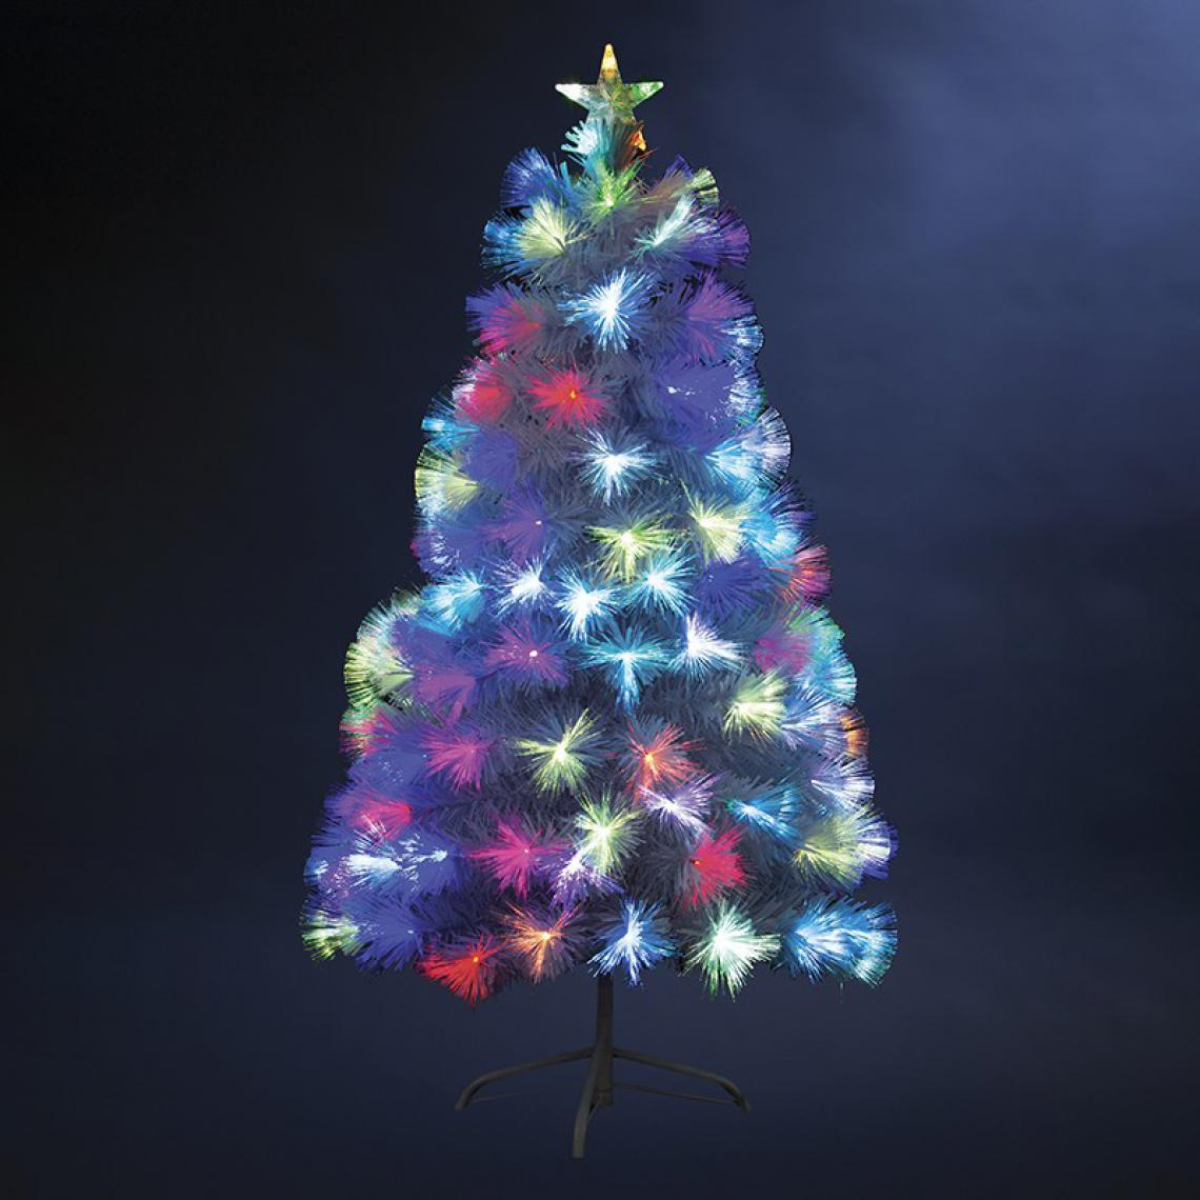 Jardideco Sapin de Noël en fibre optique - 54 x 54 cm x H 90 cm - Varsovie